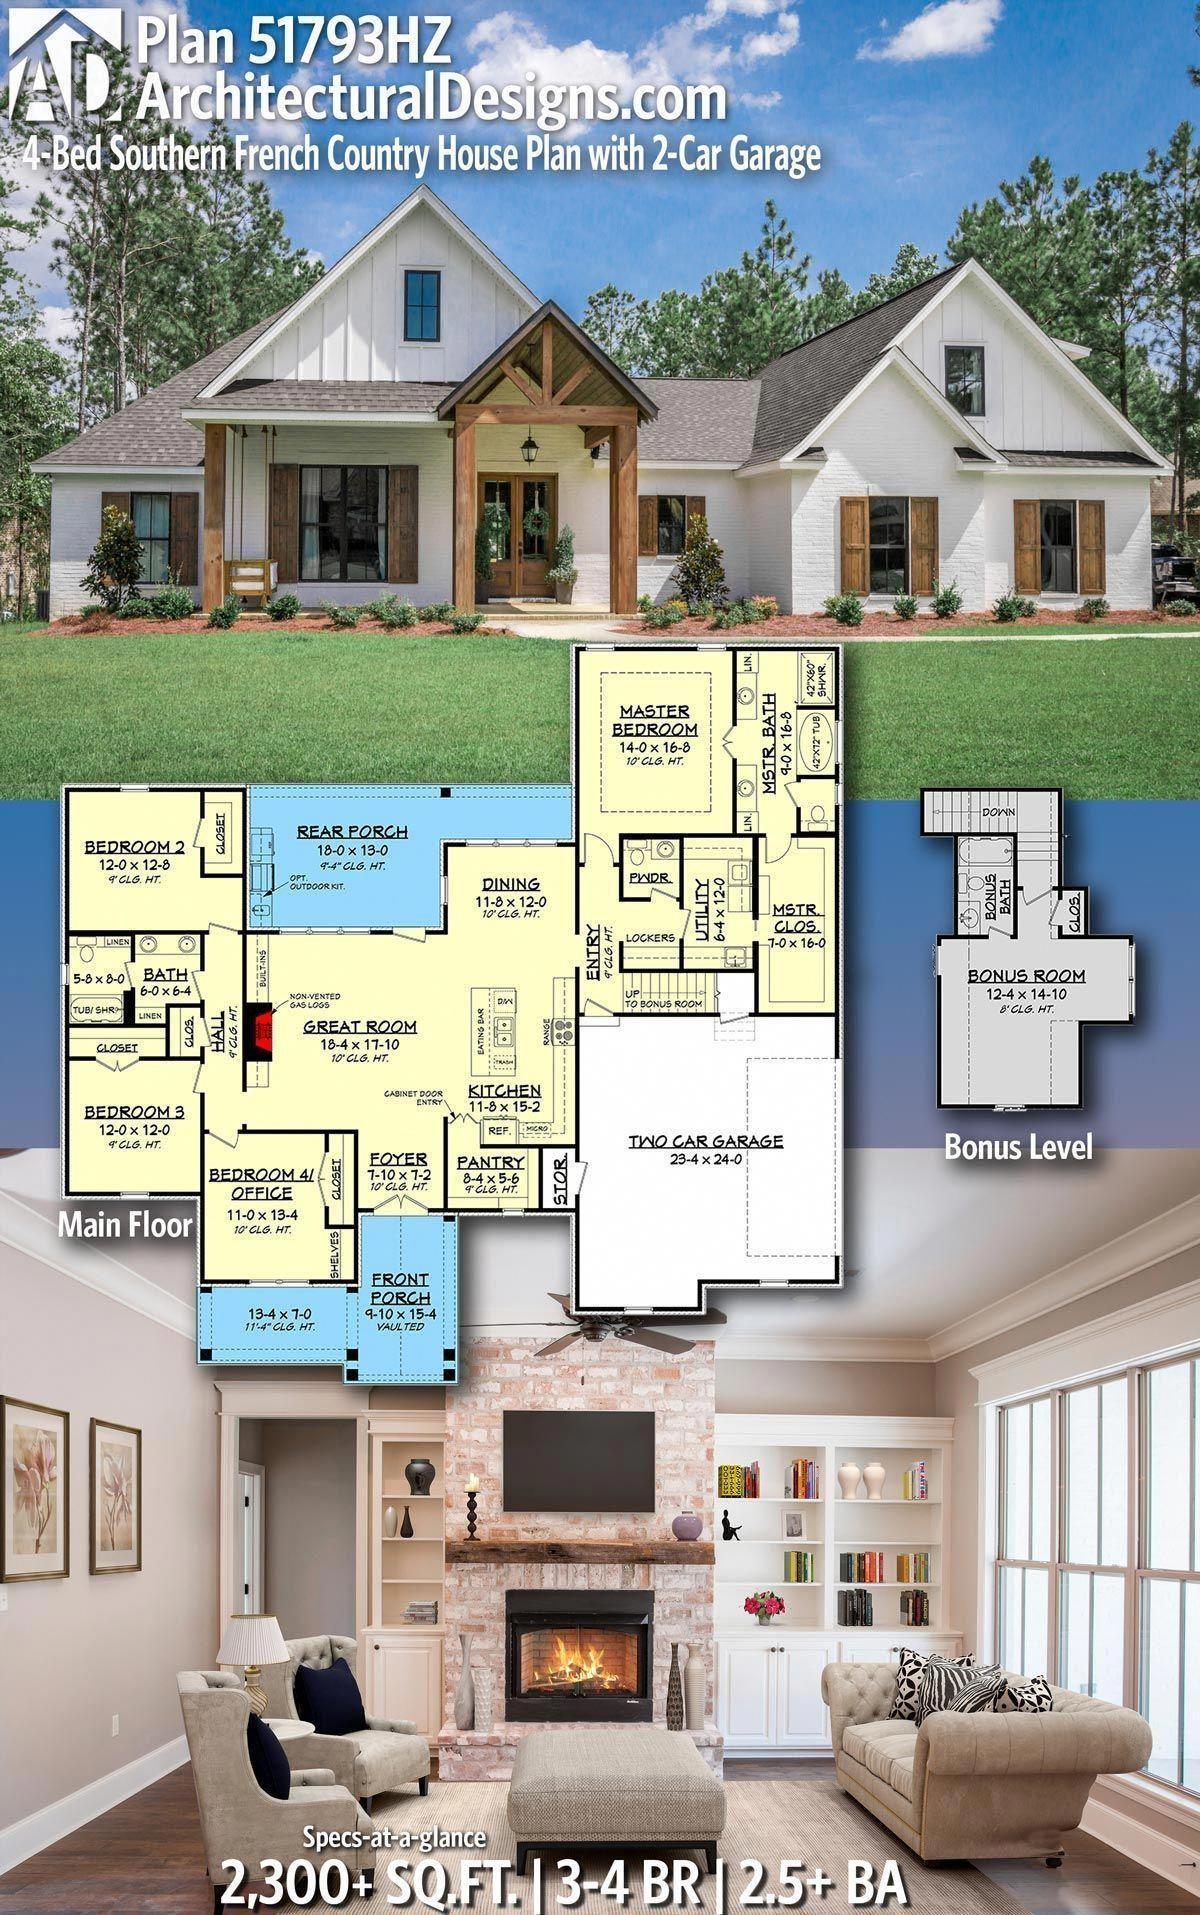 14 Brilliant Fresh Rustic Farmhouse Remodel Ideas For New